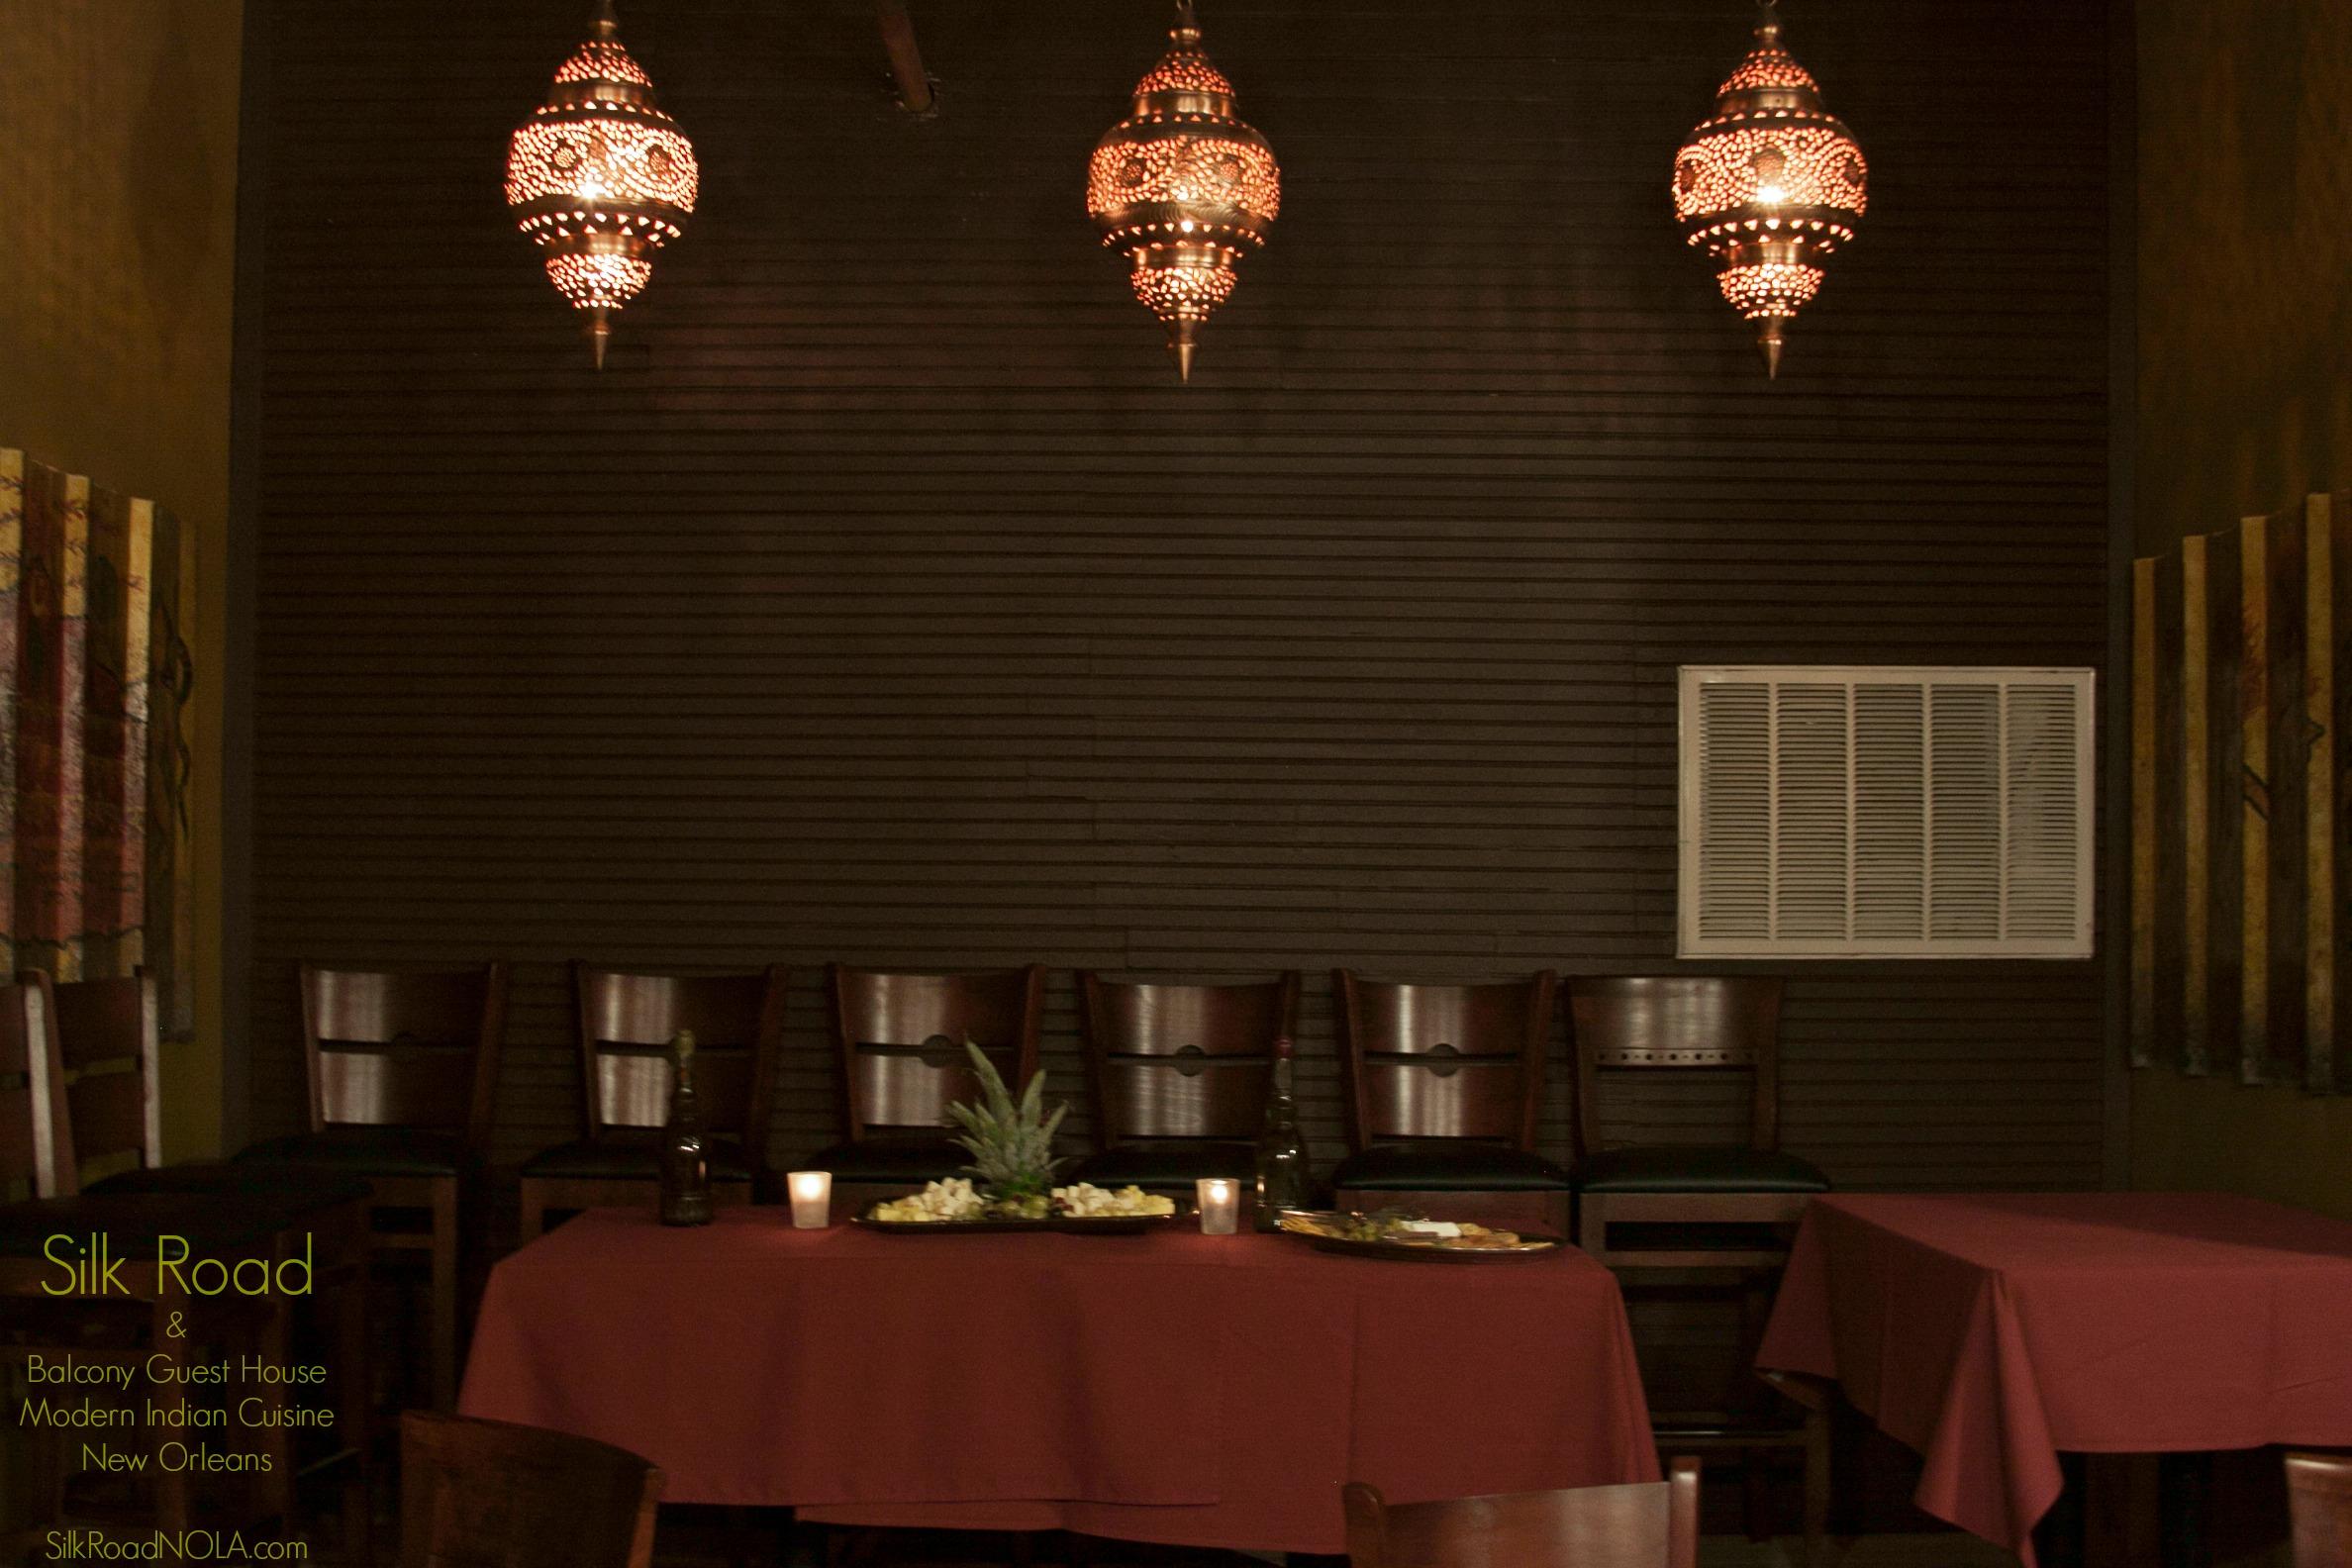 Back Room (11) silk road indian restaurant new orleans .jpg